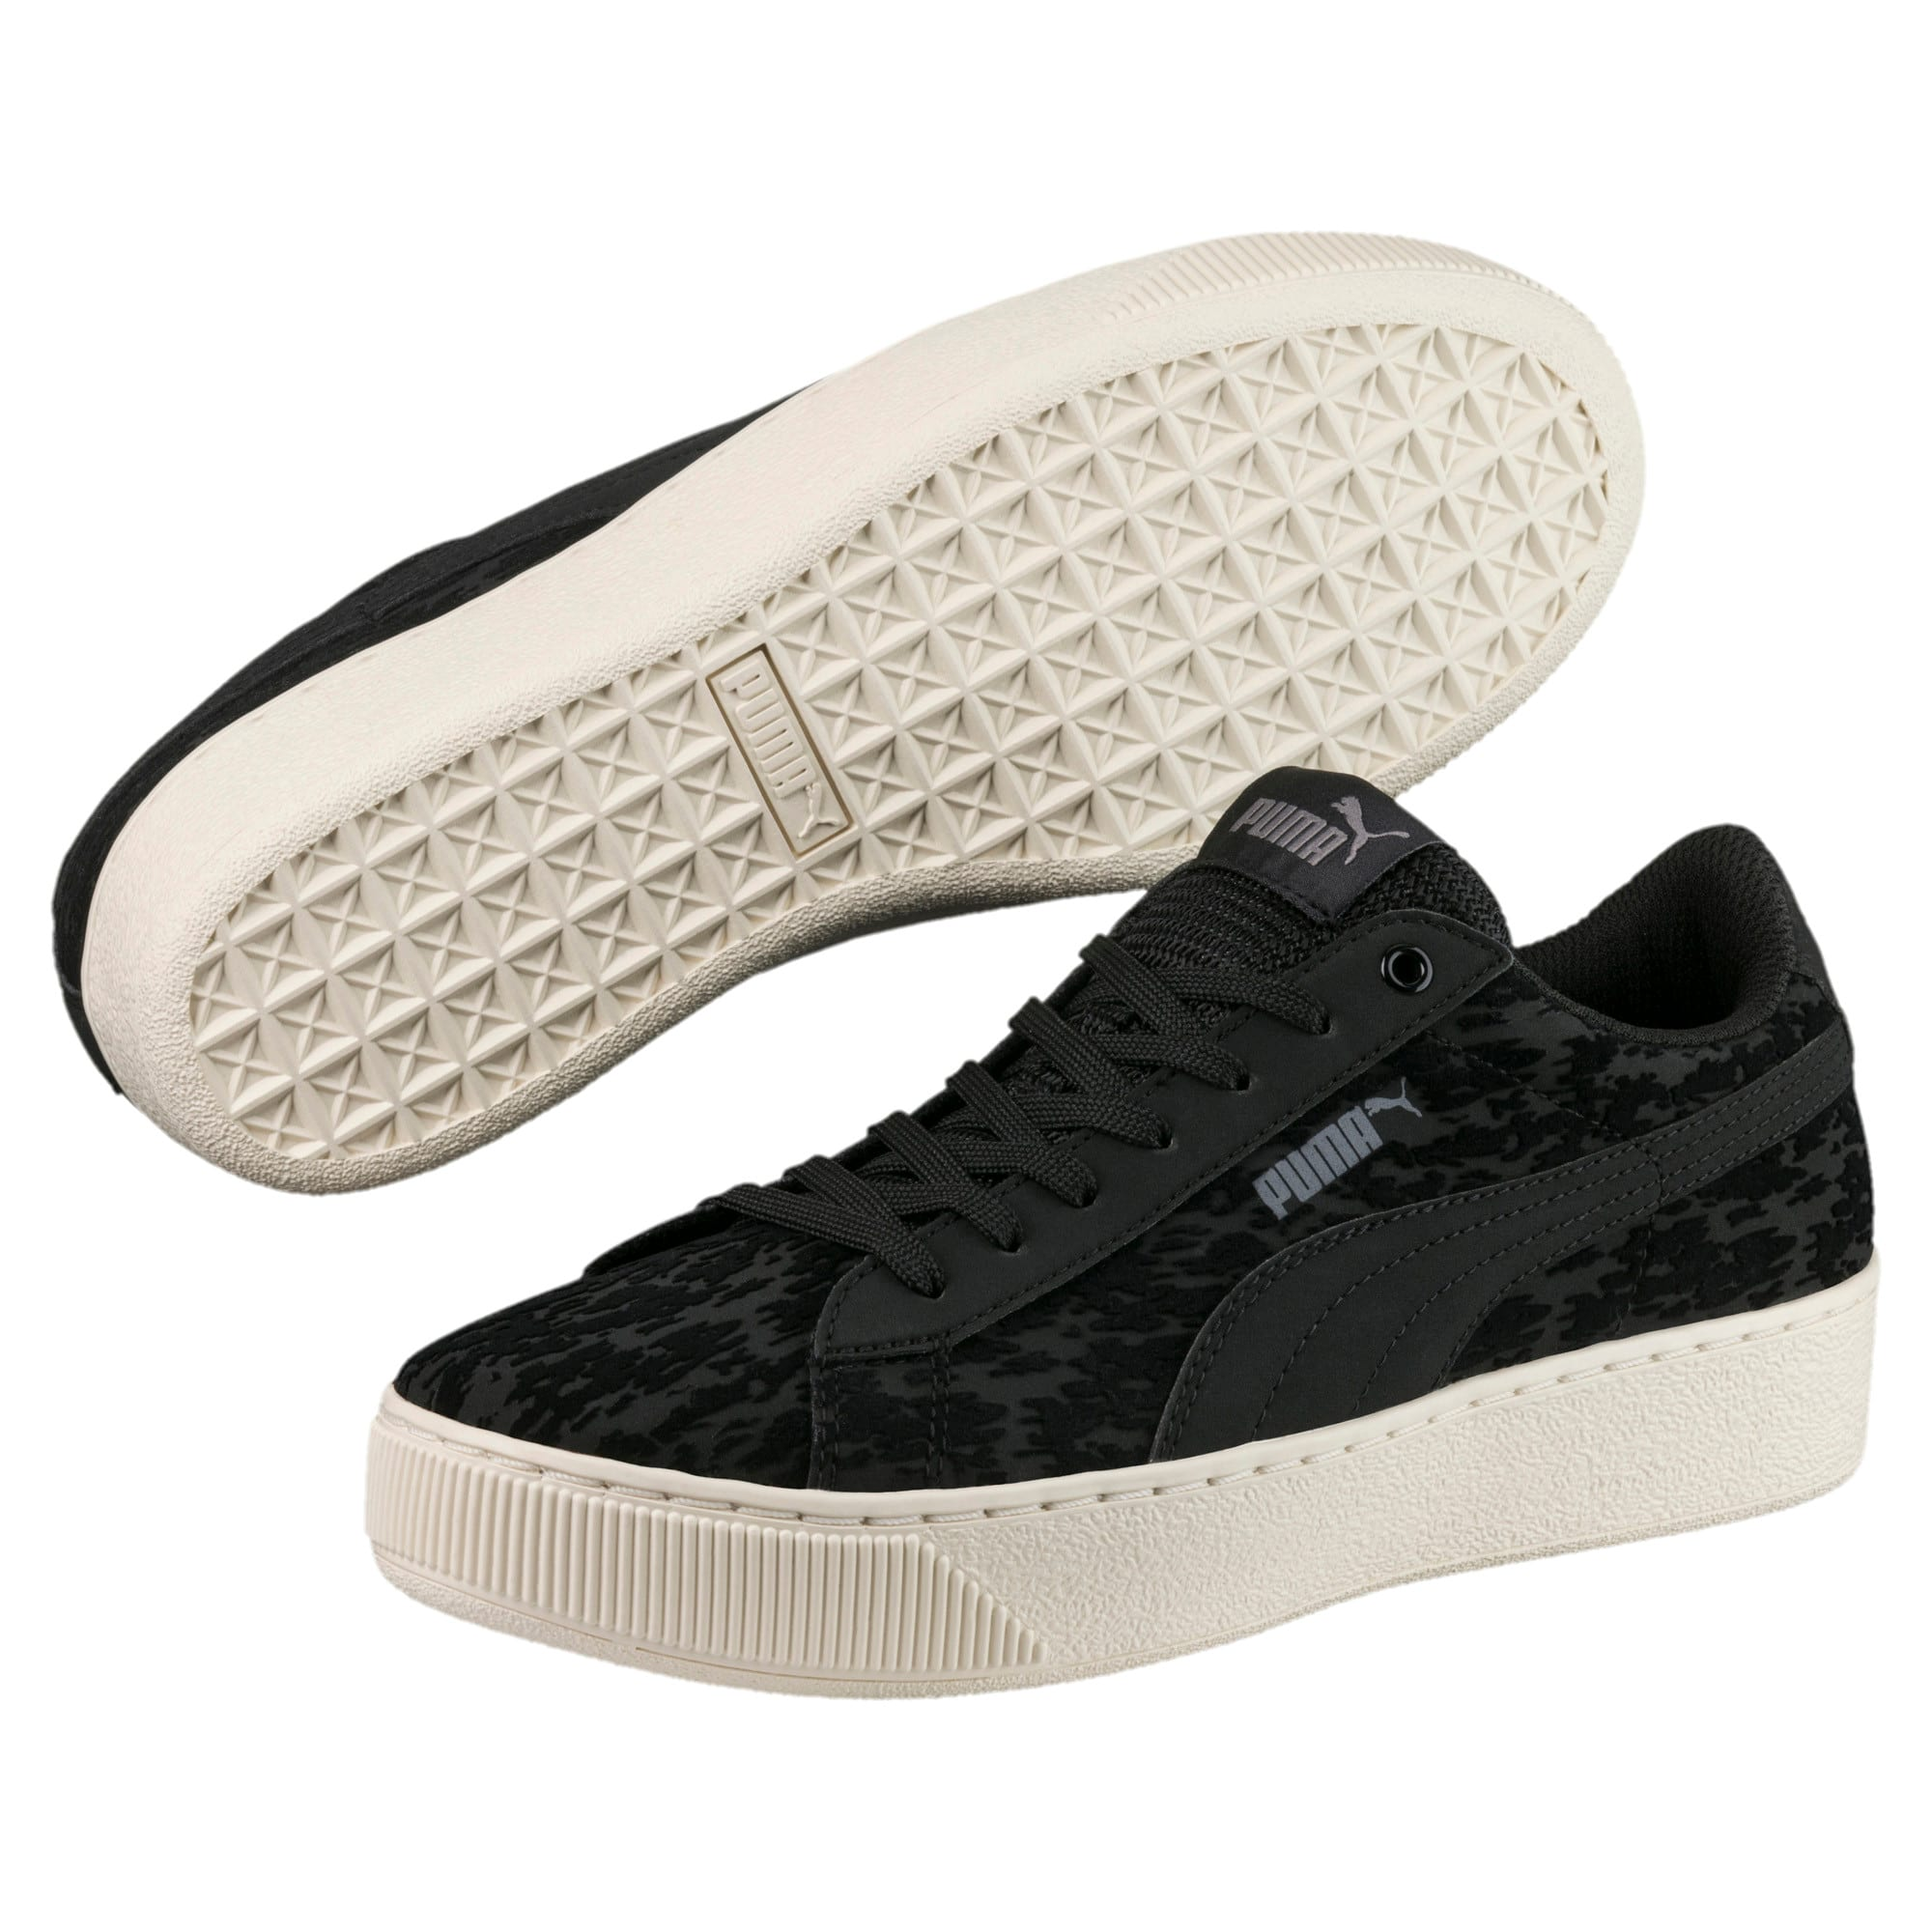 Thumbnail 2 of Vikky Platform Velvet Rope Women's Sneakers, Puma Black-Puma Black, medium